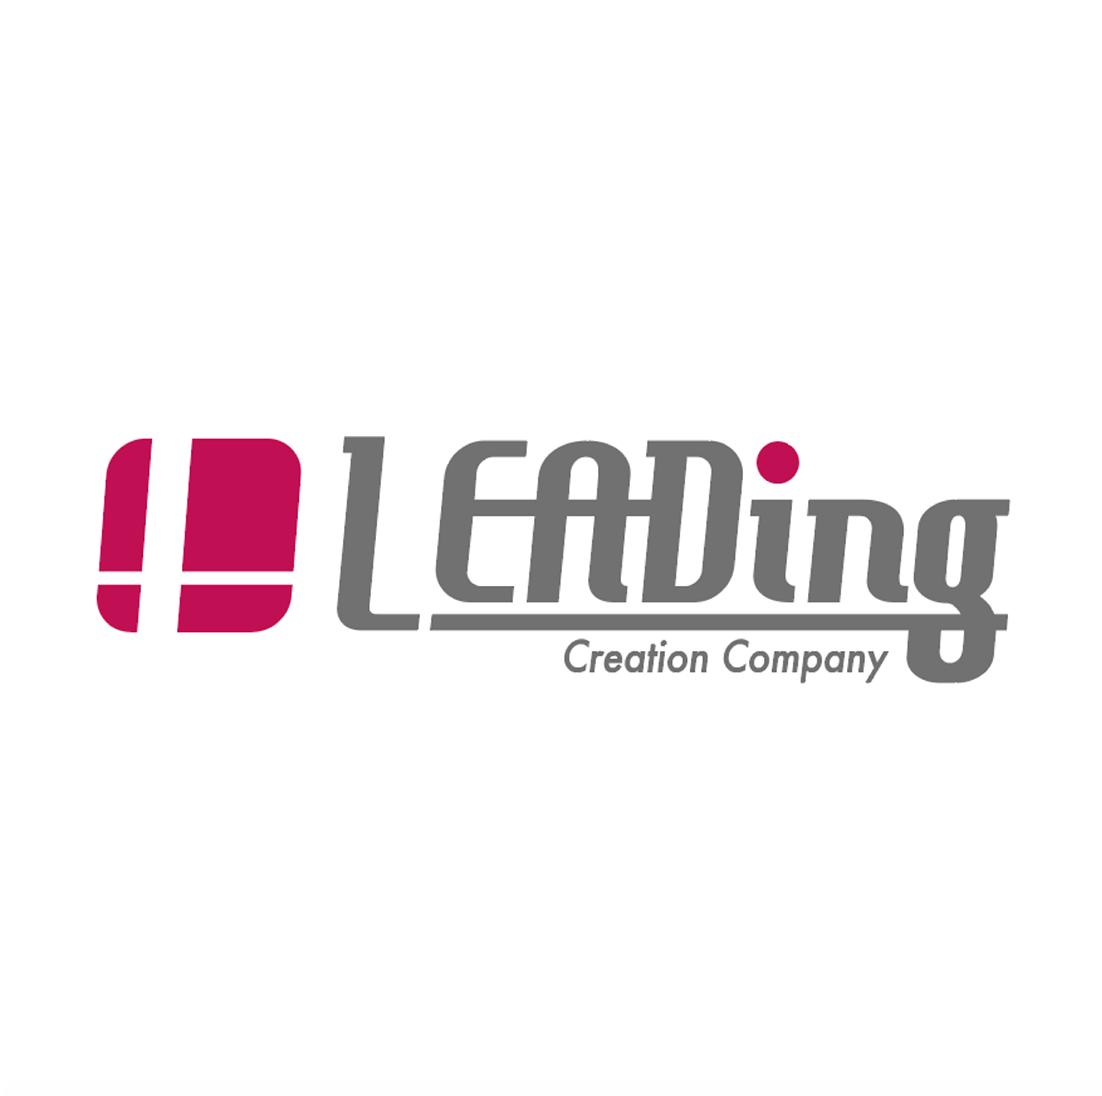 LEADING ロゴデザイン